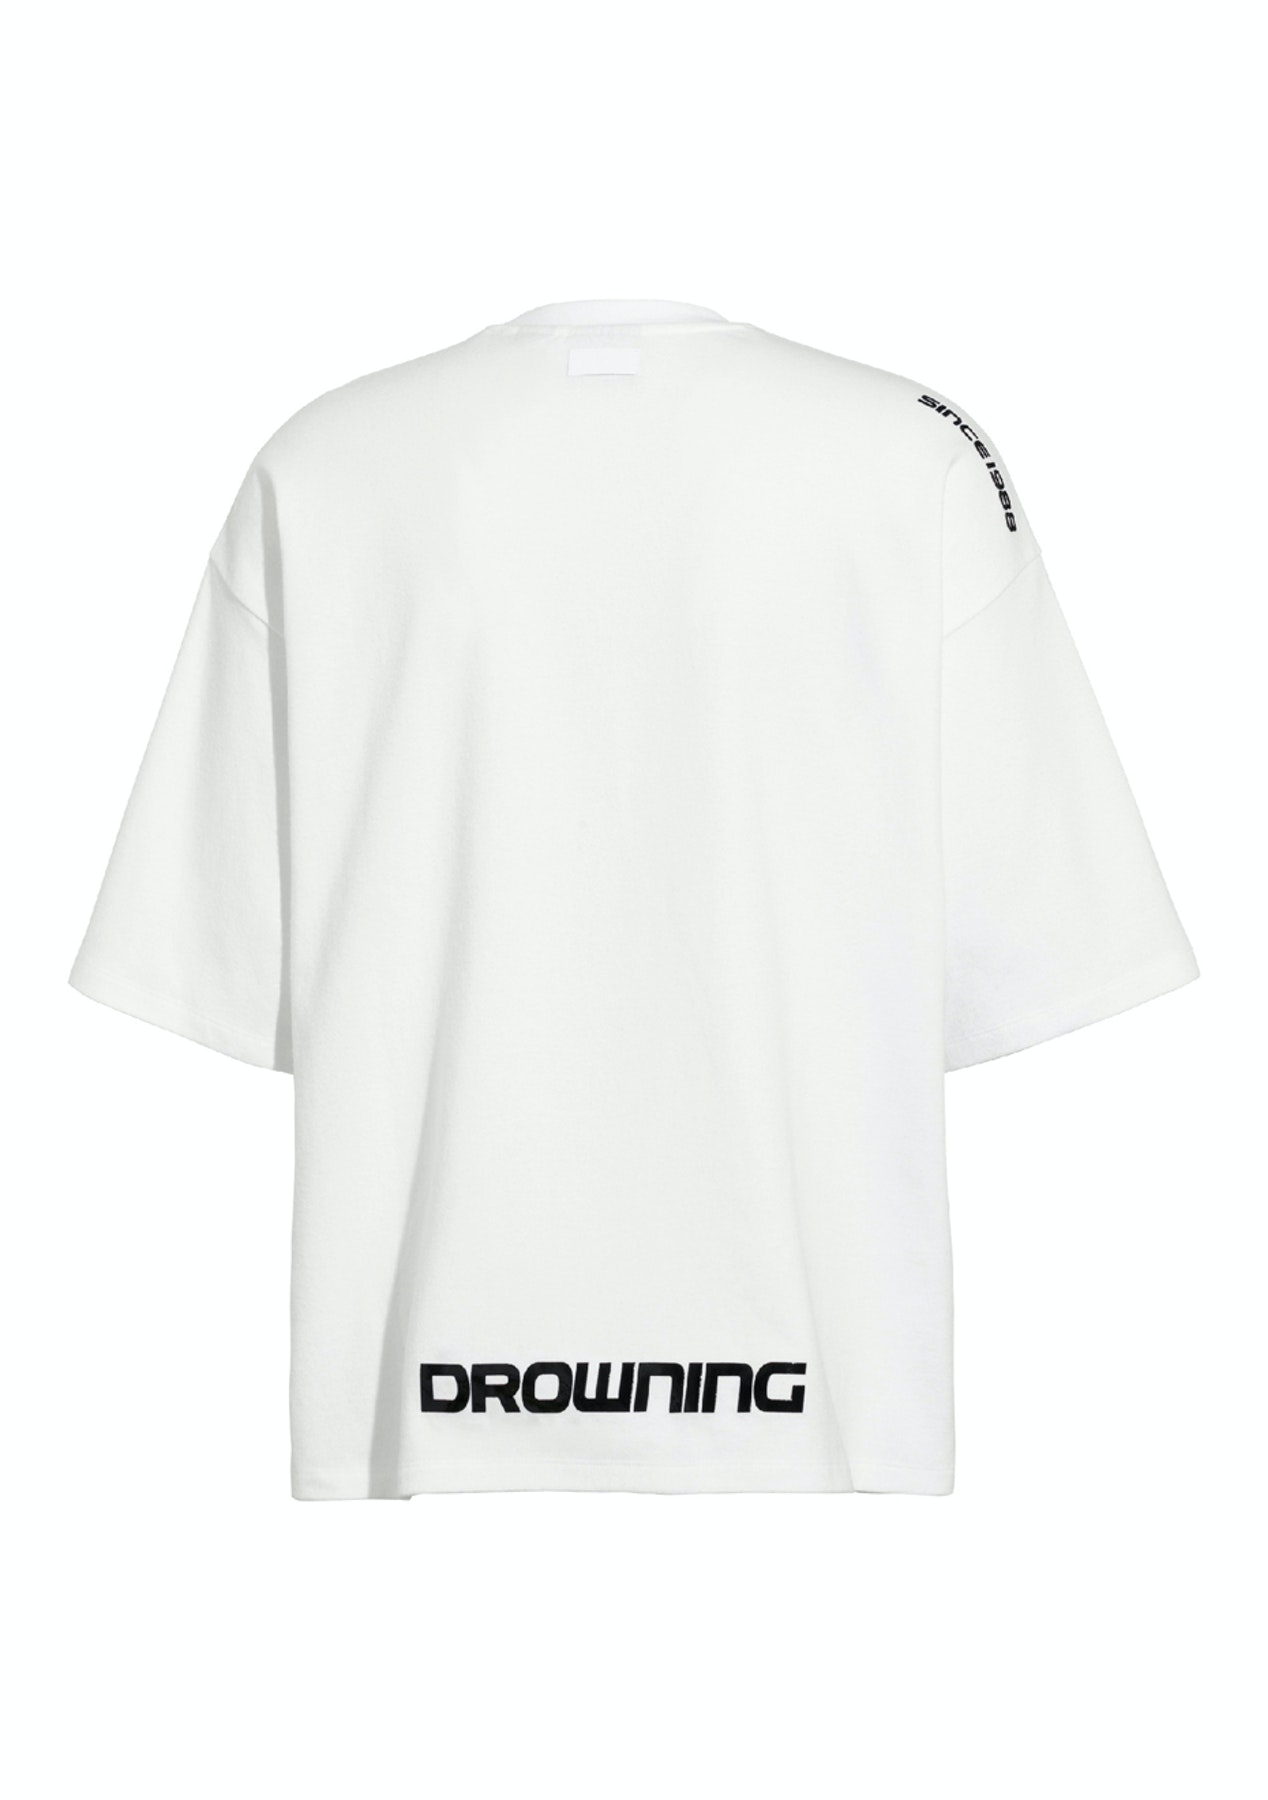 low priced d5cd9 dc746 FENTY Short Sleeve Crew Neck T-Shirt - Bright White